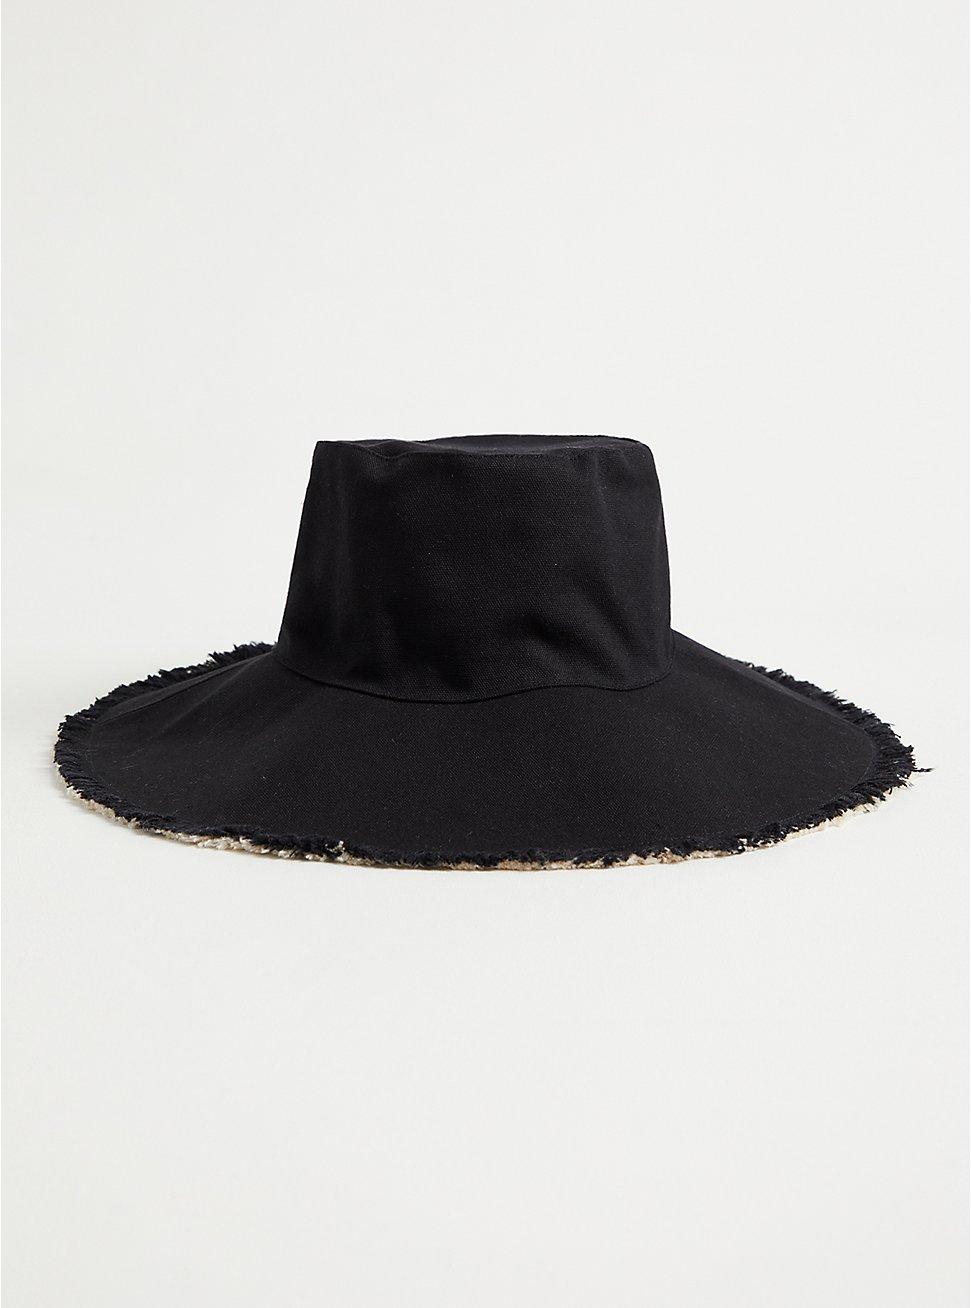 Black & Beige Reversible Bucket Hat, BLACK, hi-res